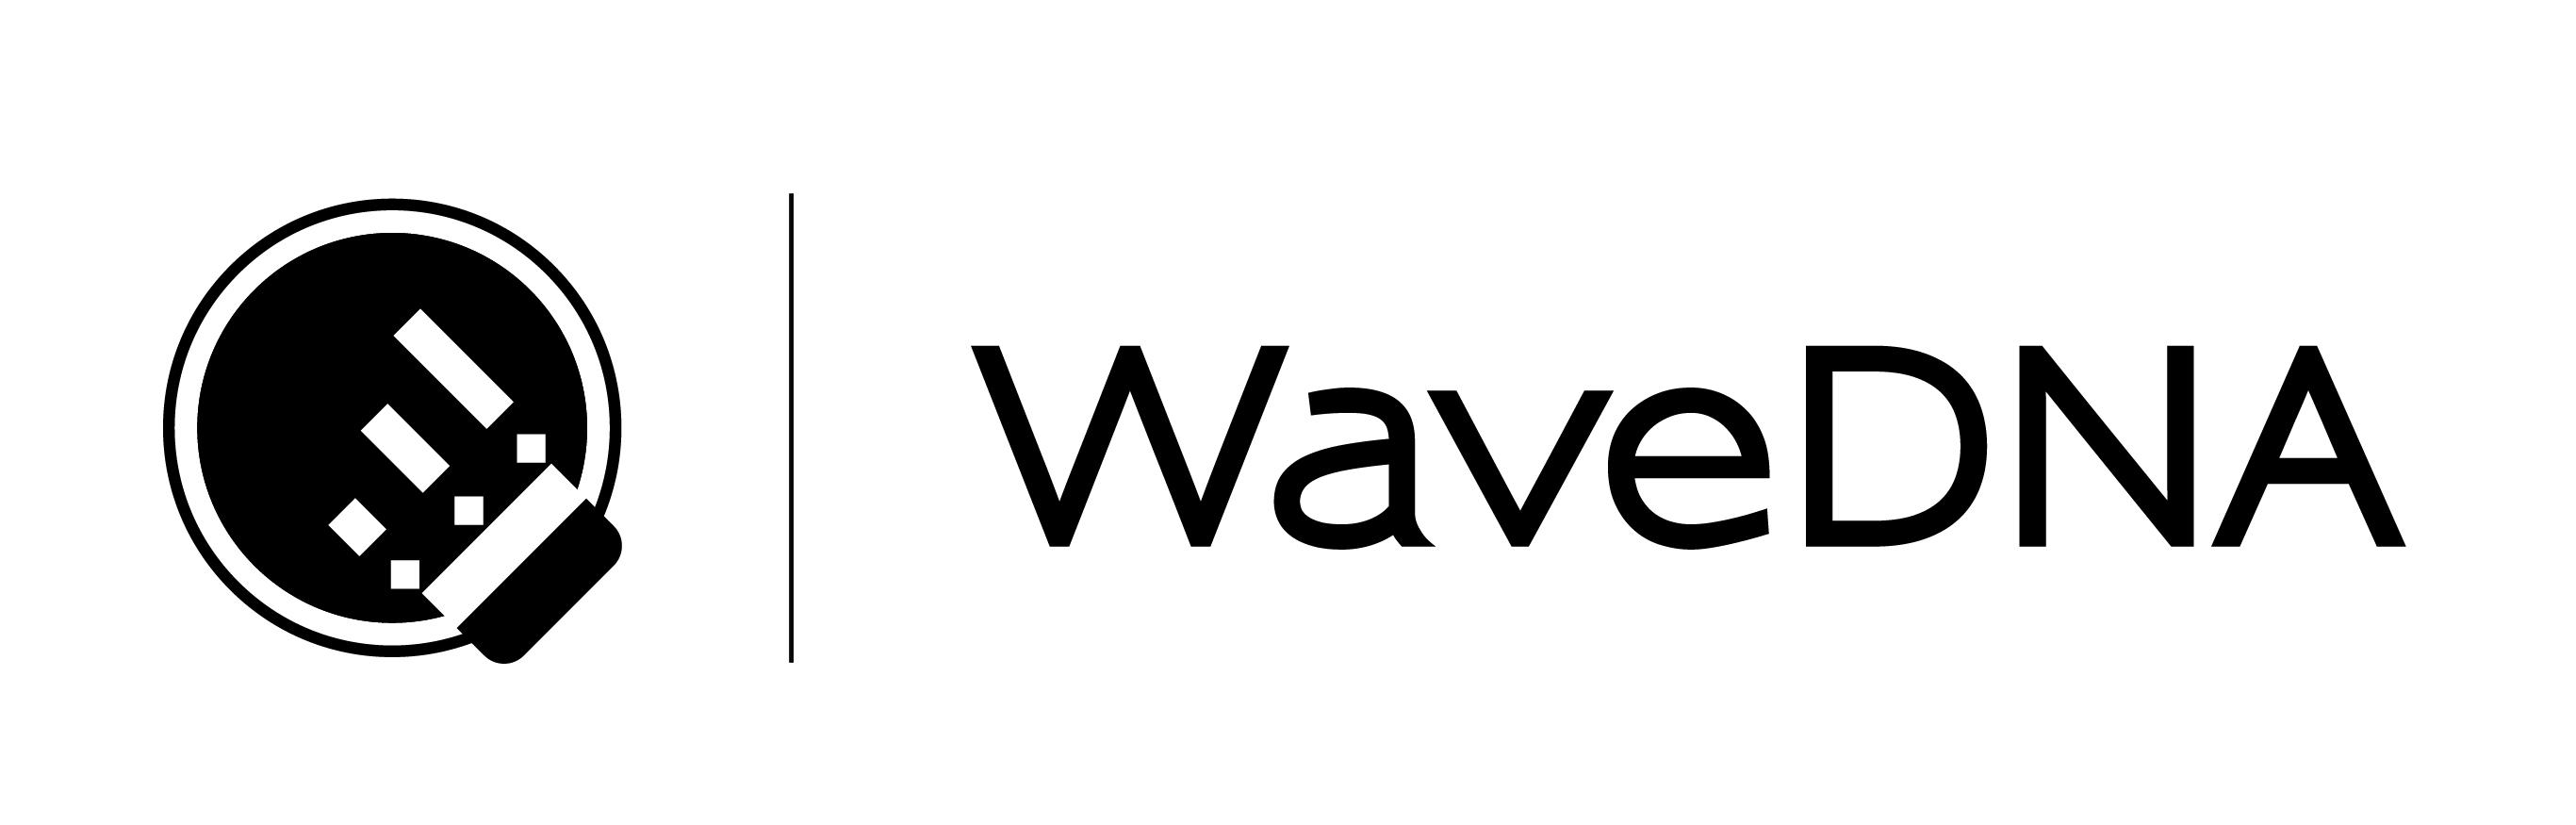 Wavedna logo